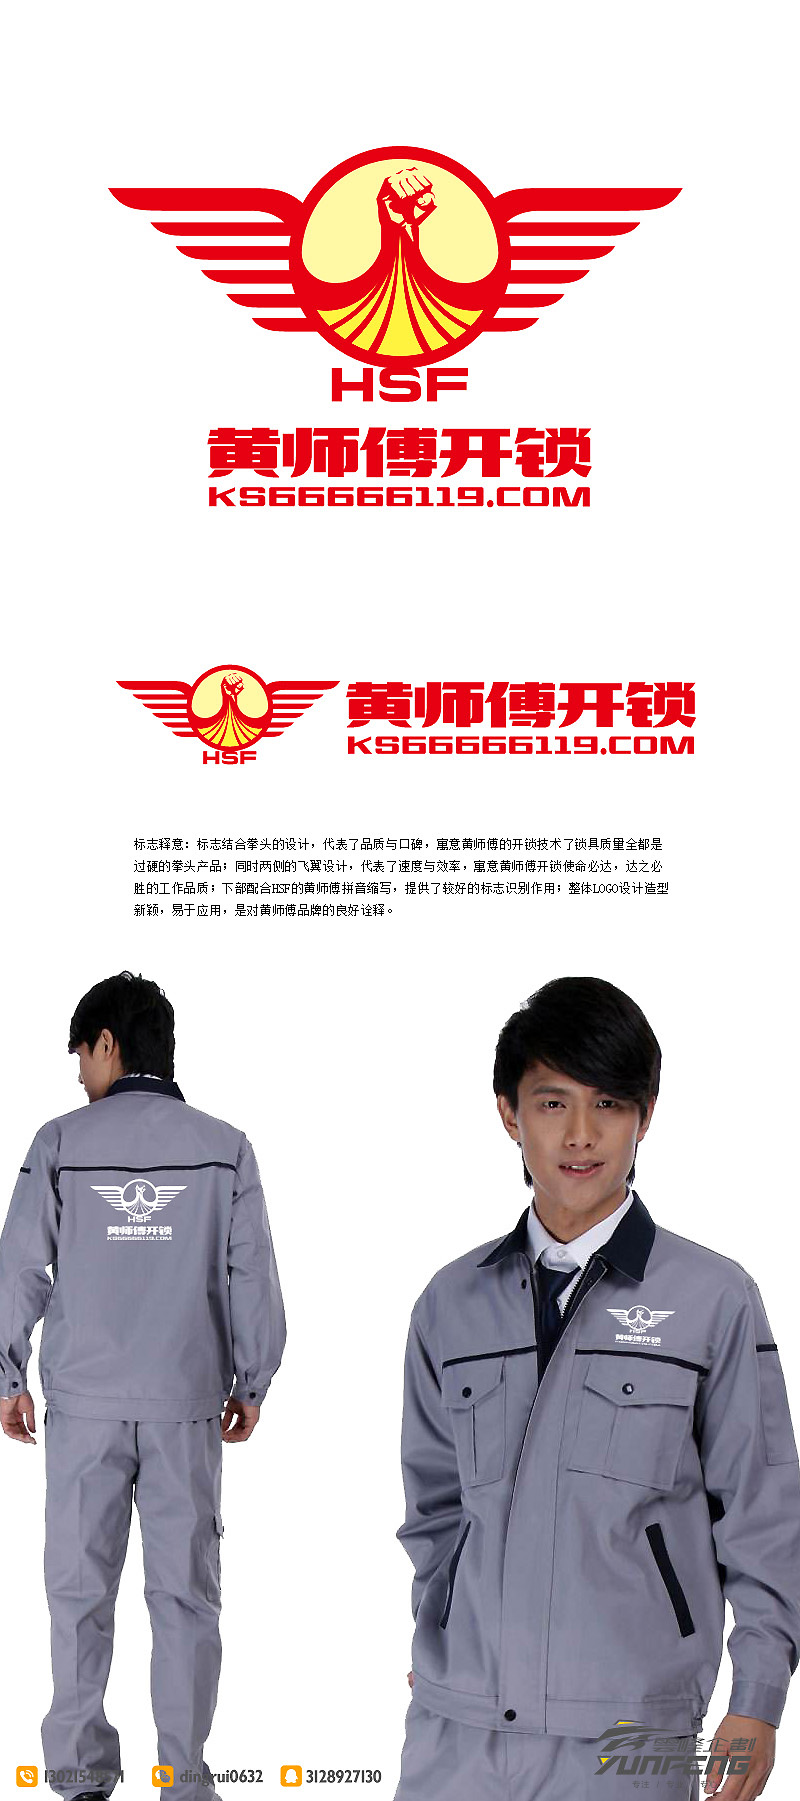 �S��傅�_�i�W站logo�O� (5天完成)_3024327_k68威客�W